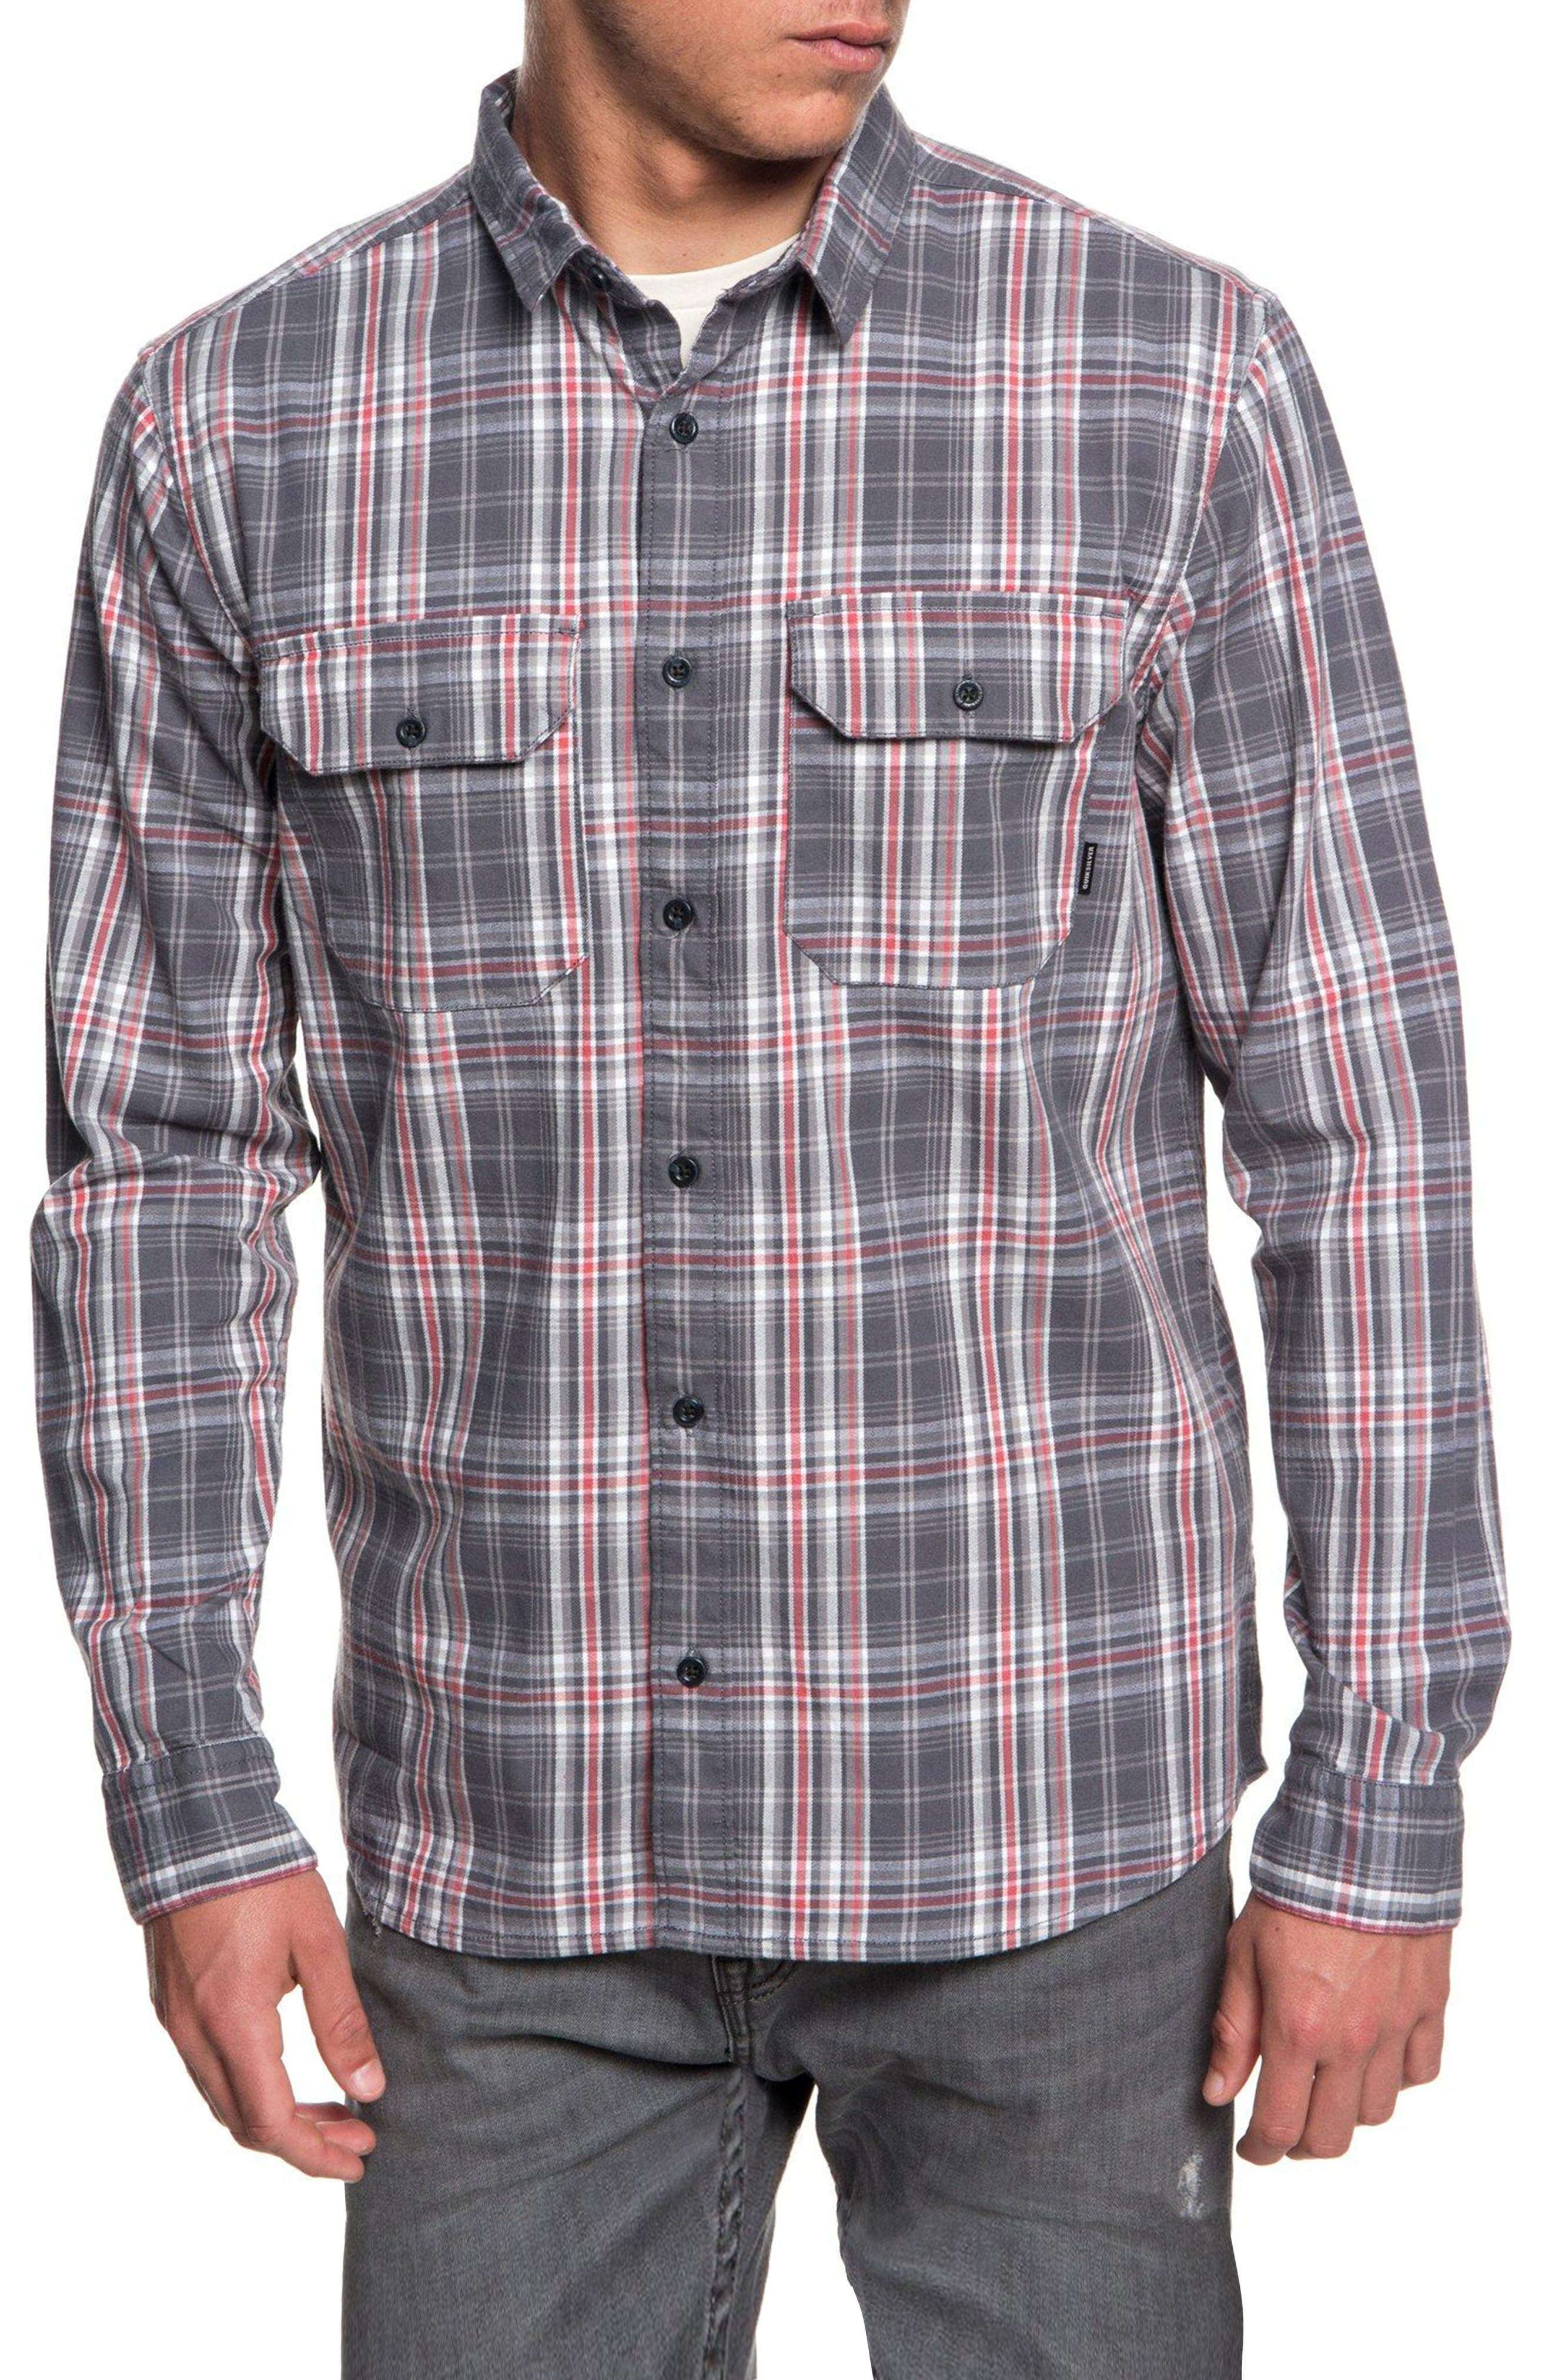 Quiksilver Fitz Sport Shirt, Grey